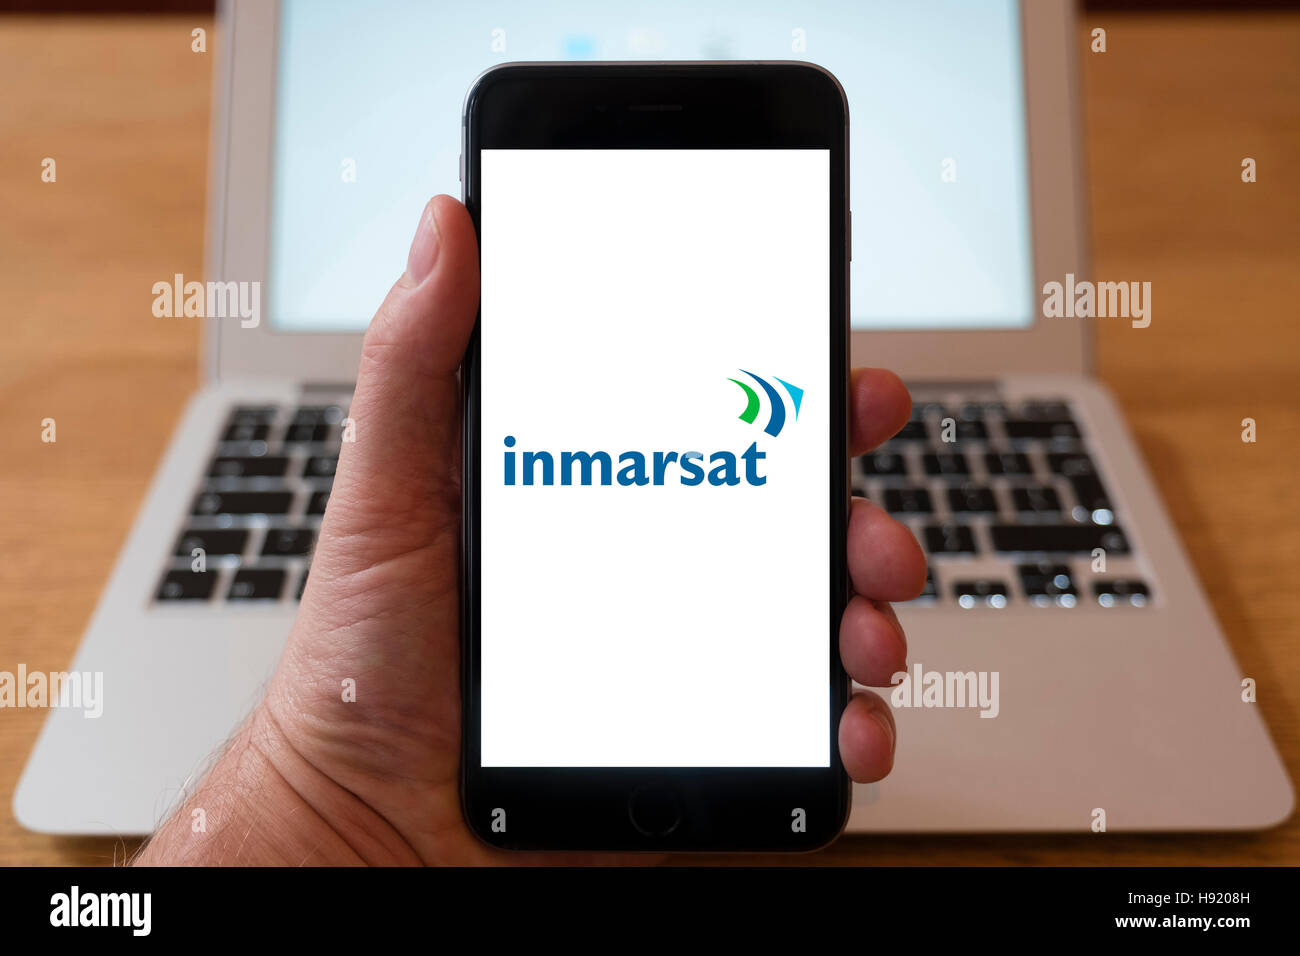 Using iPhone smart phone to display website logo of Immarsat a British satellite telecommunications company - Stock Image